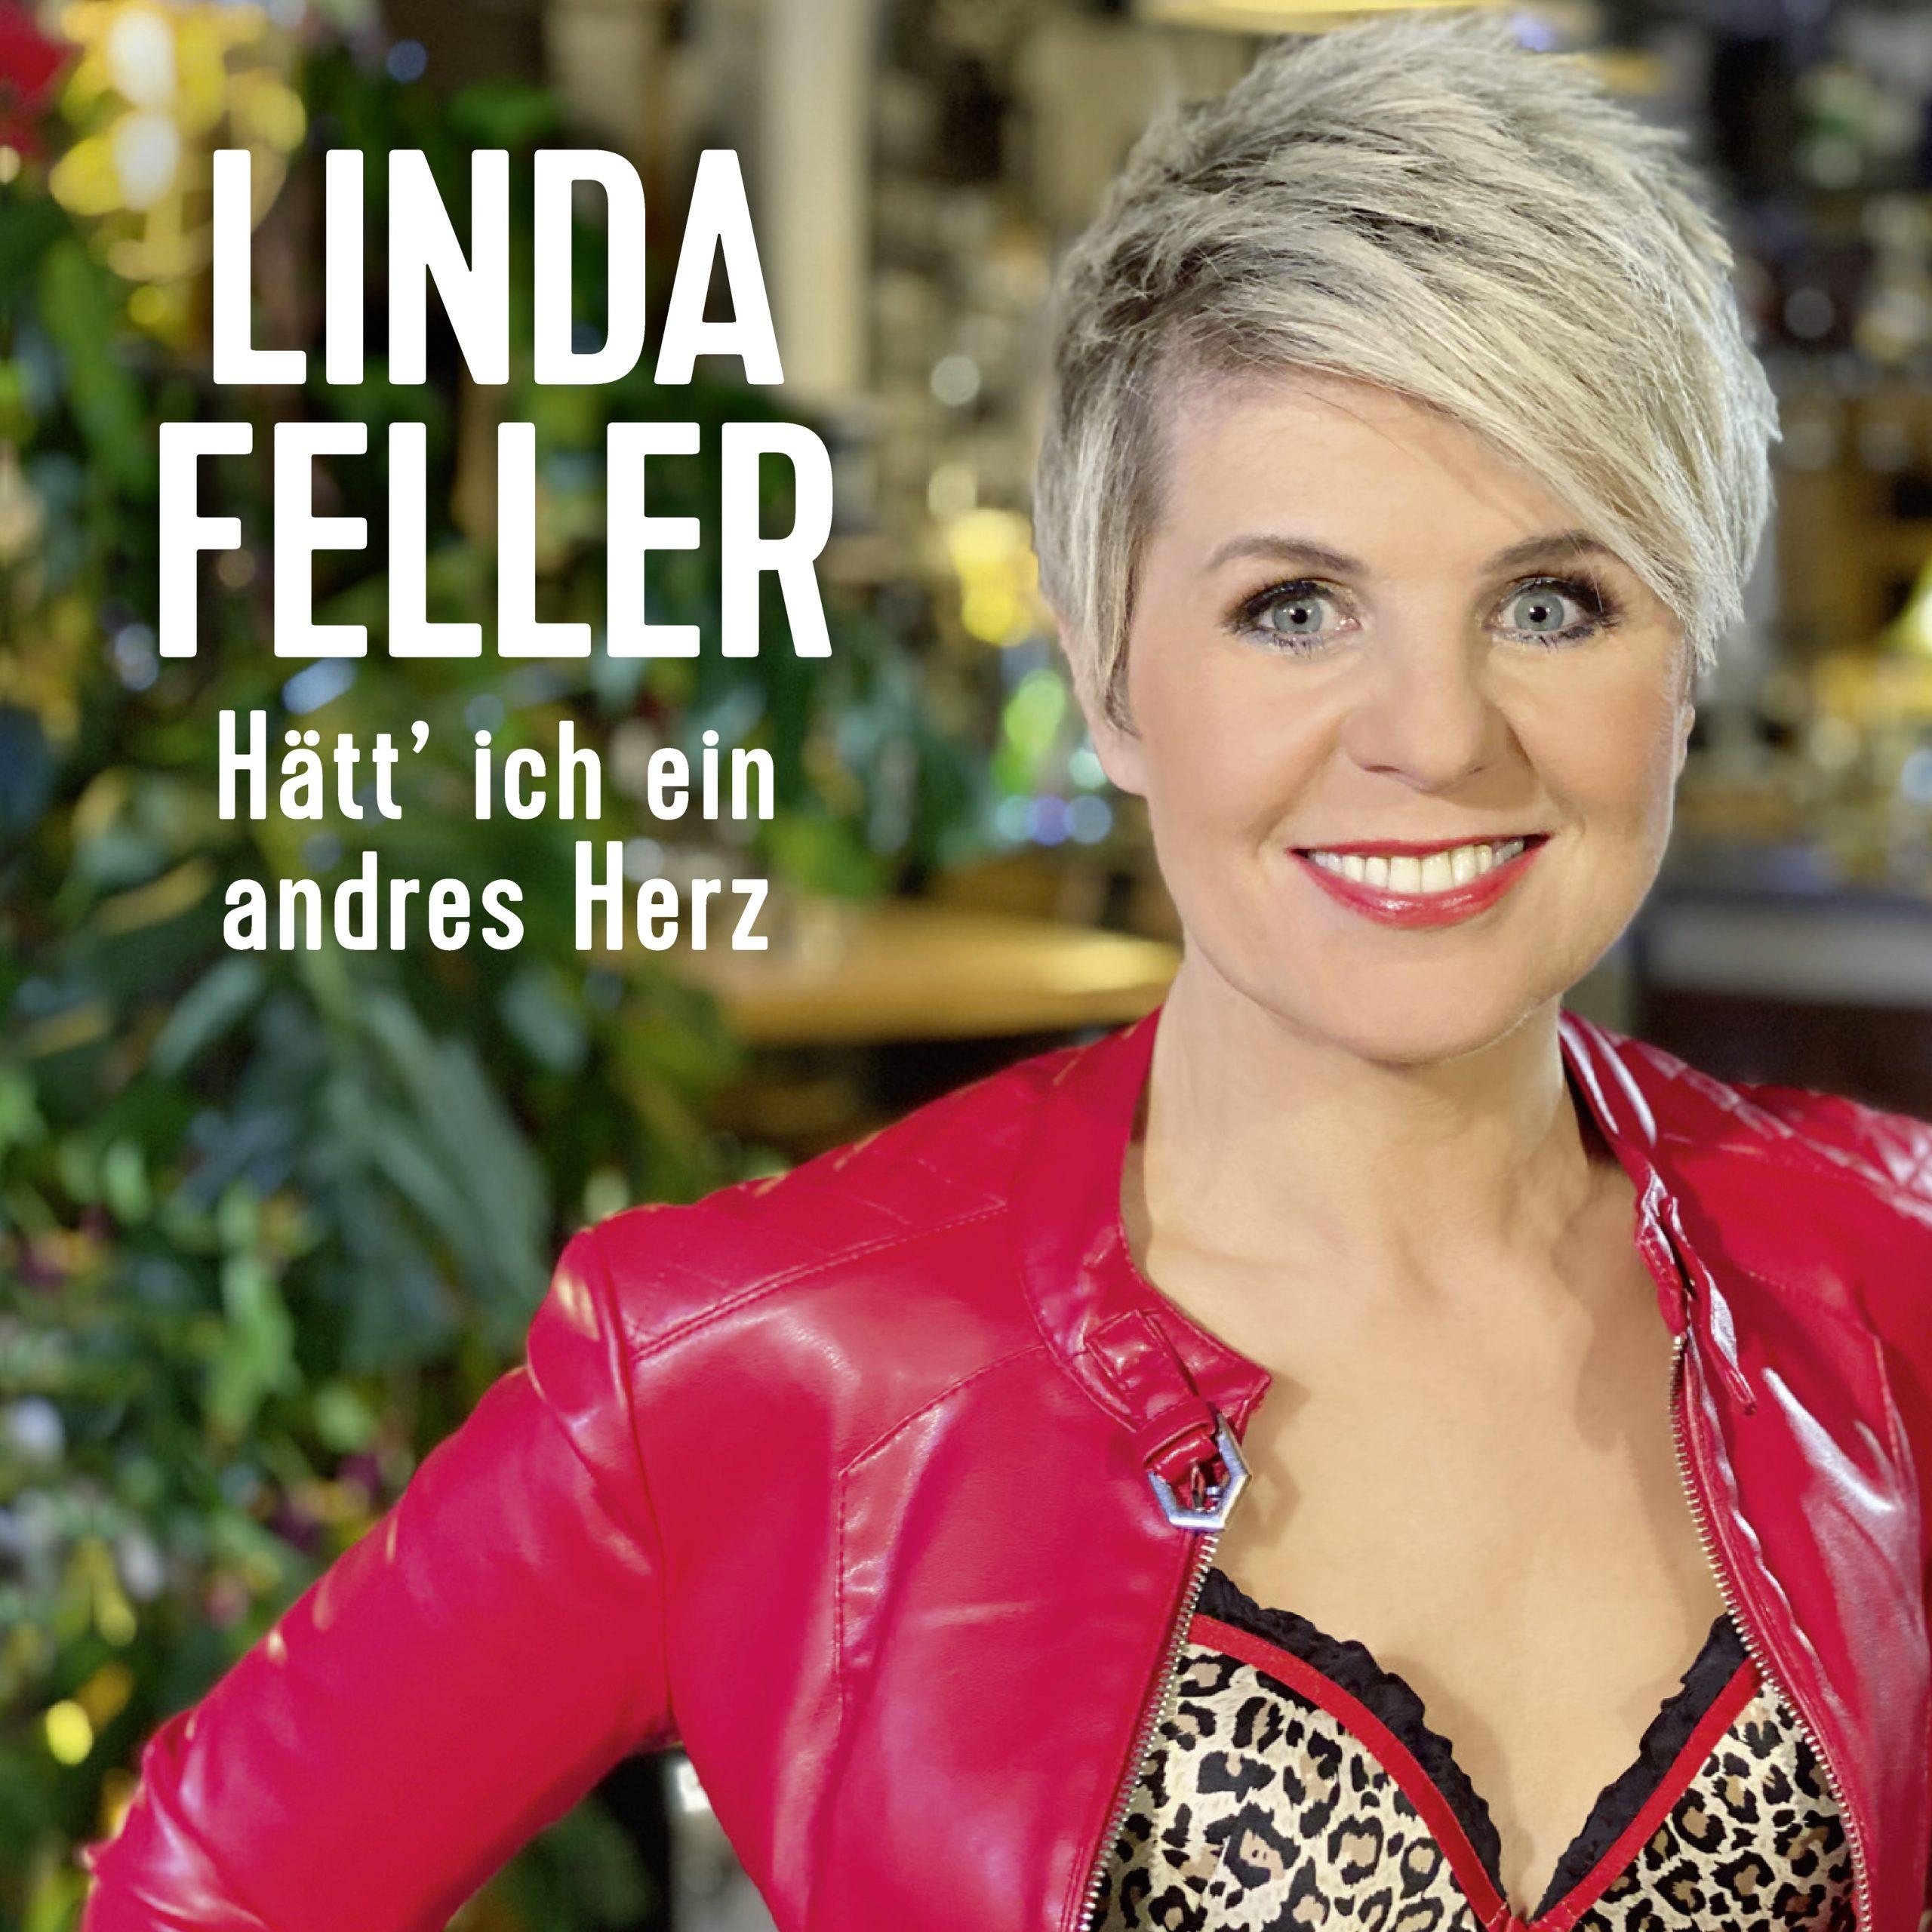 Linda Feller - Hätt' ich ein andres Herz (2020) Cover